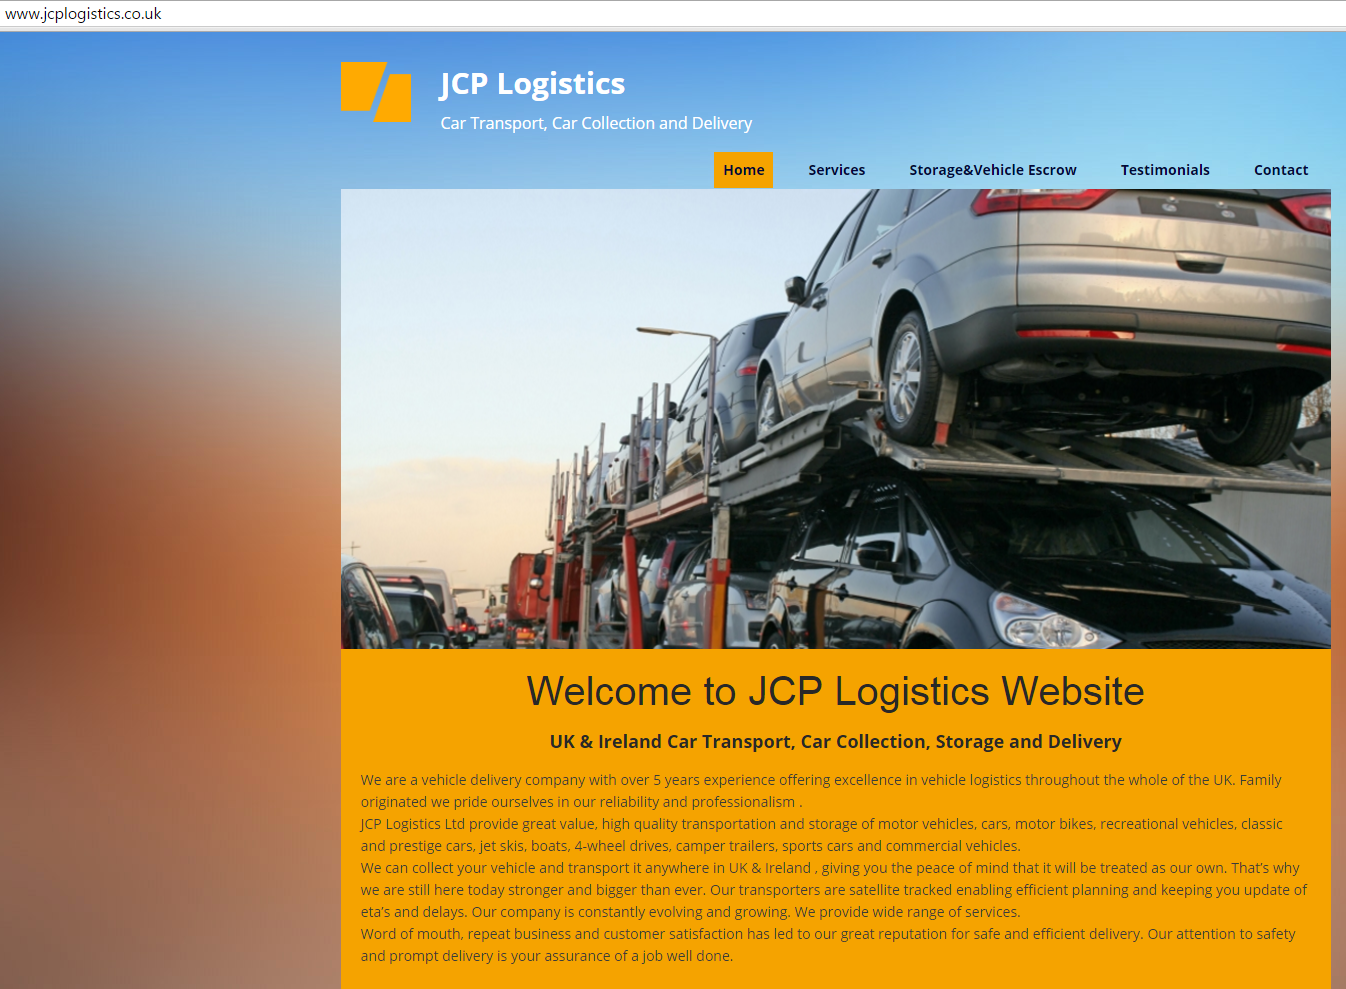 Jack Buster Jack Ebay Pistonheads Autotrader Scam Dummy Company Jcp Logistics Fraud Theft Money Laundering